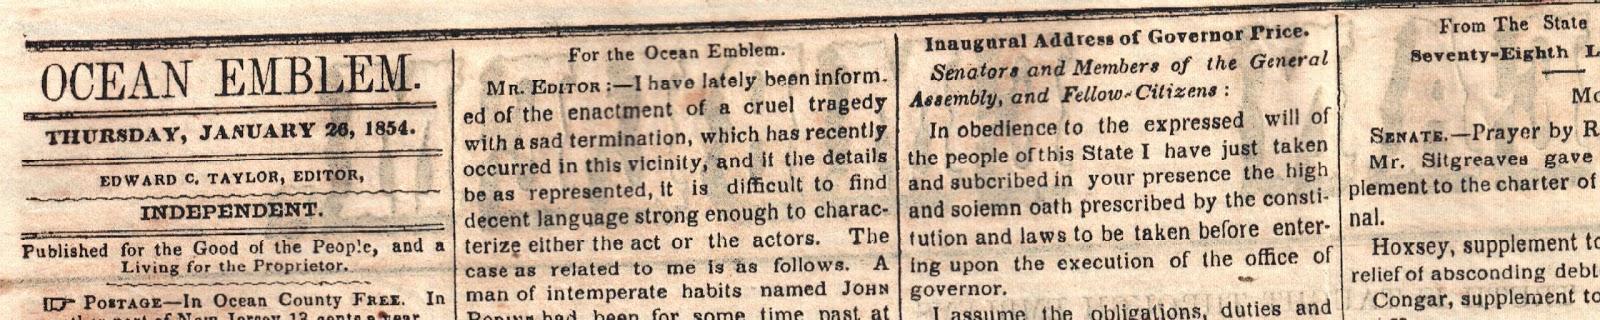 Ocean Emblem 26 Jan 1854